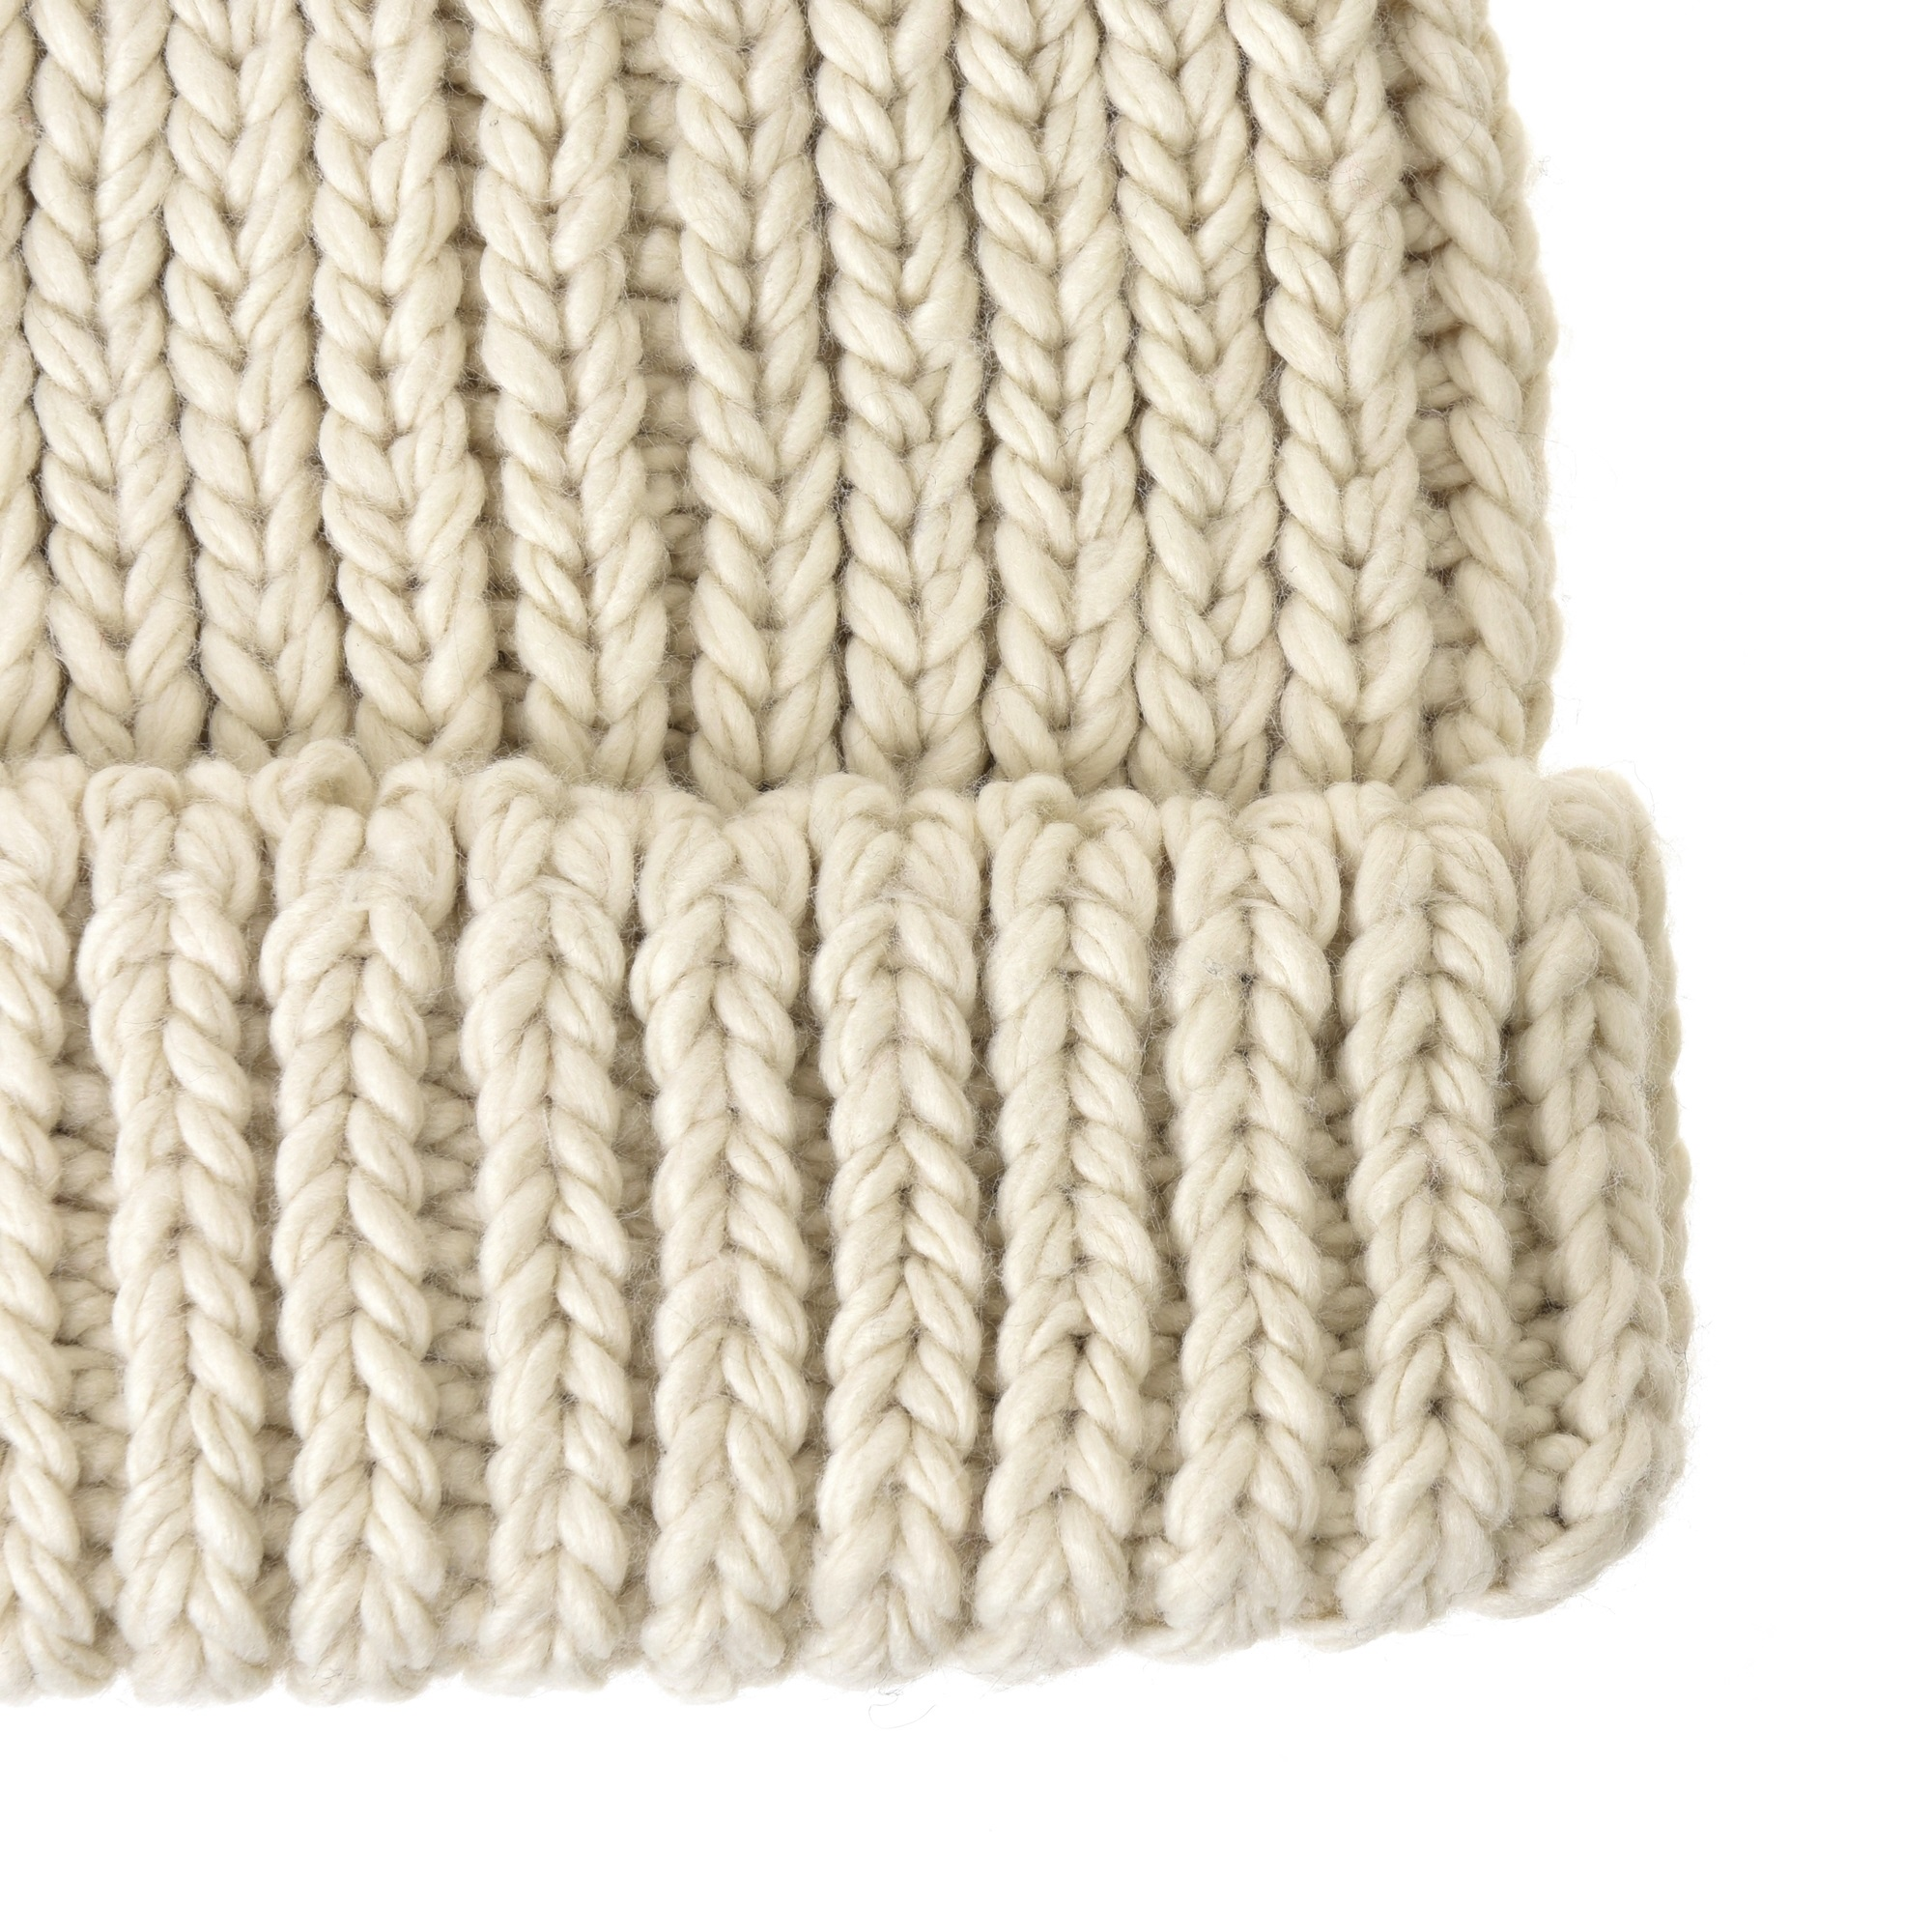 a30330ada06 WITHMOONS Knit Beanie Hat Basic Plain Thick Crochet Watch Cap KR5911 (Ivory)  - Walmart.com